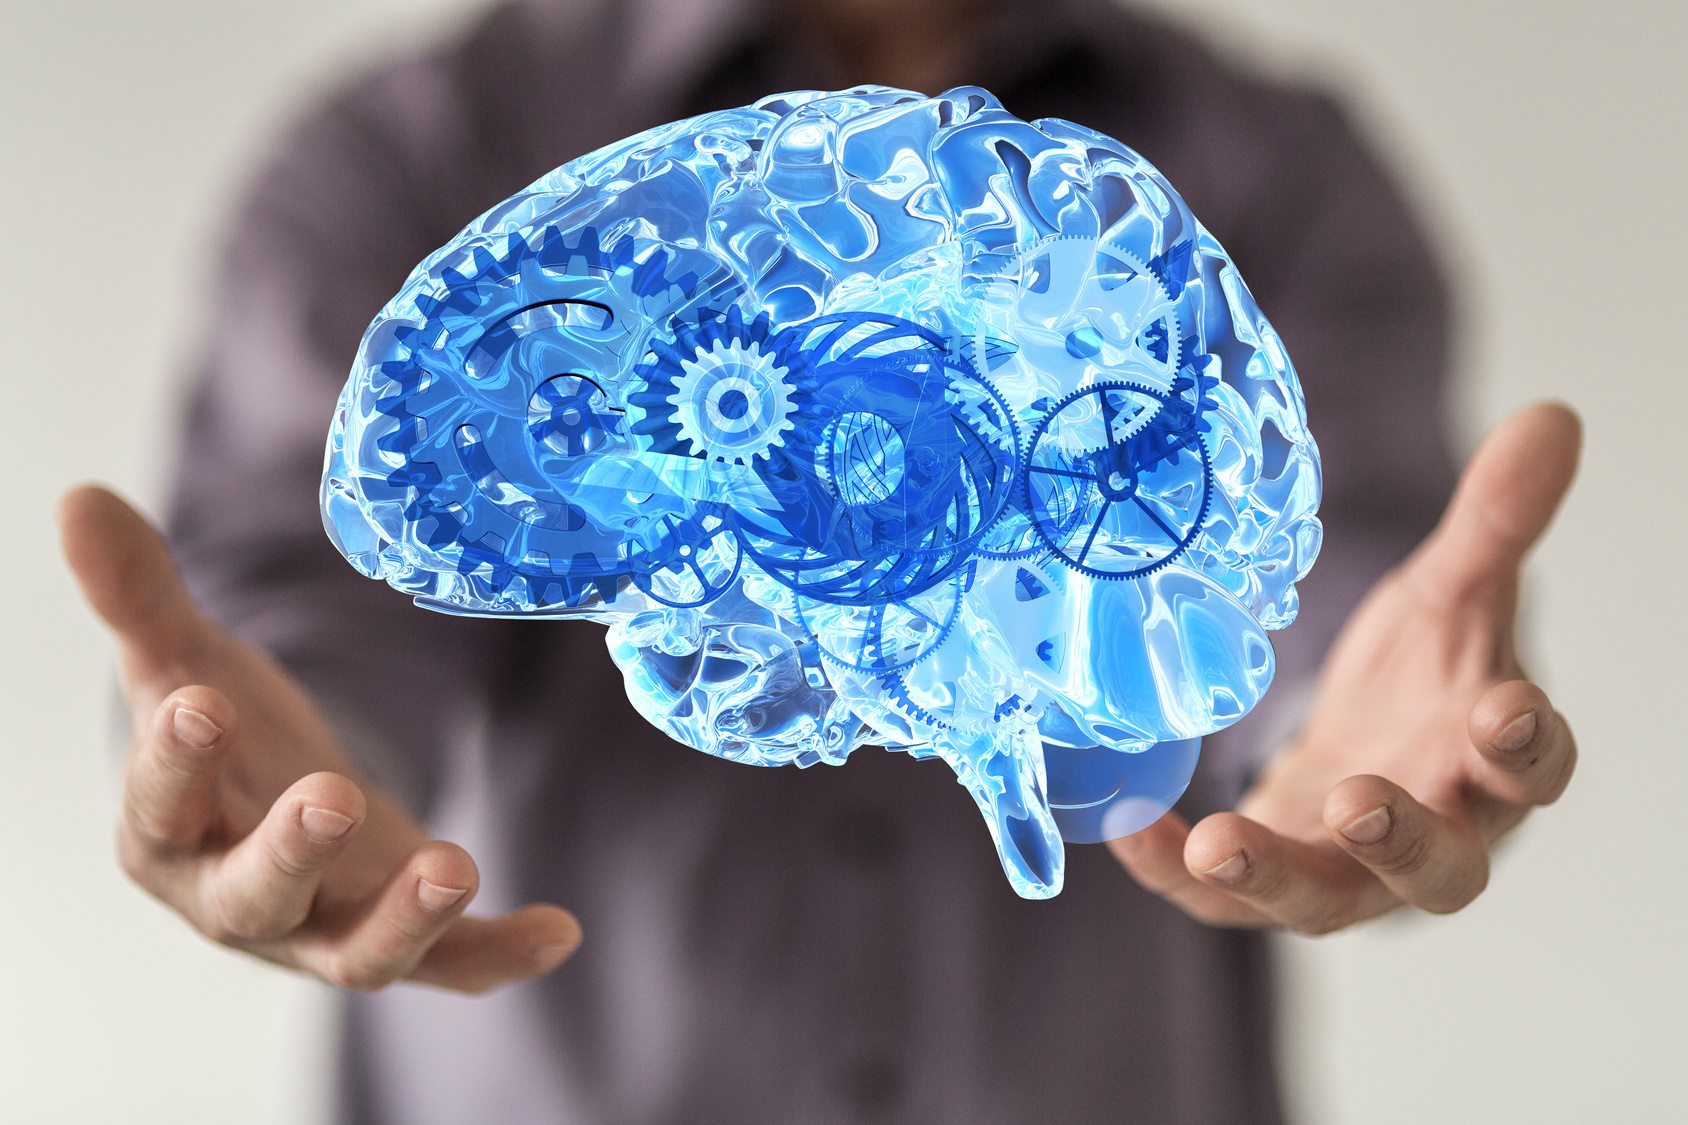 症状・疾患別受診すべき医療機関⑭-神経系の症状・疾患:神経内科・脳神経外科